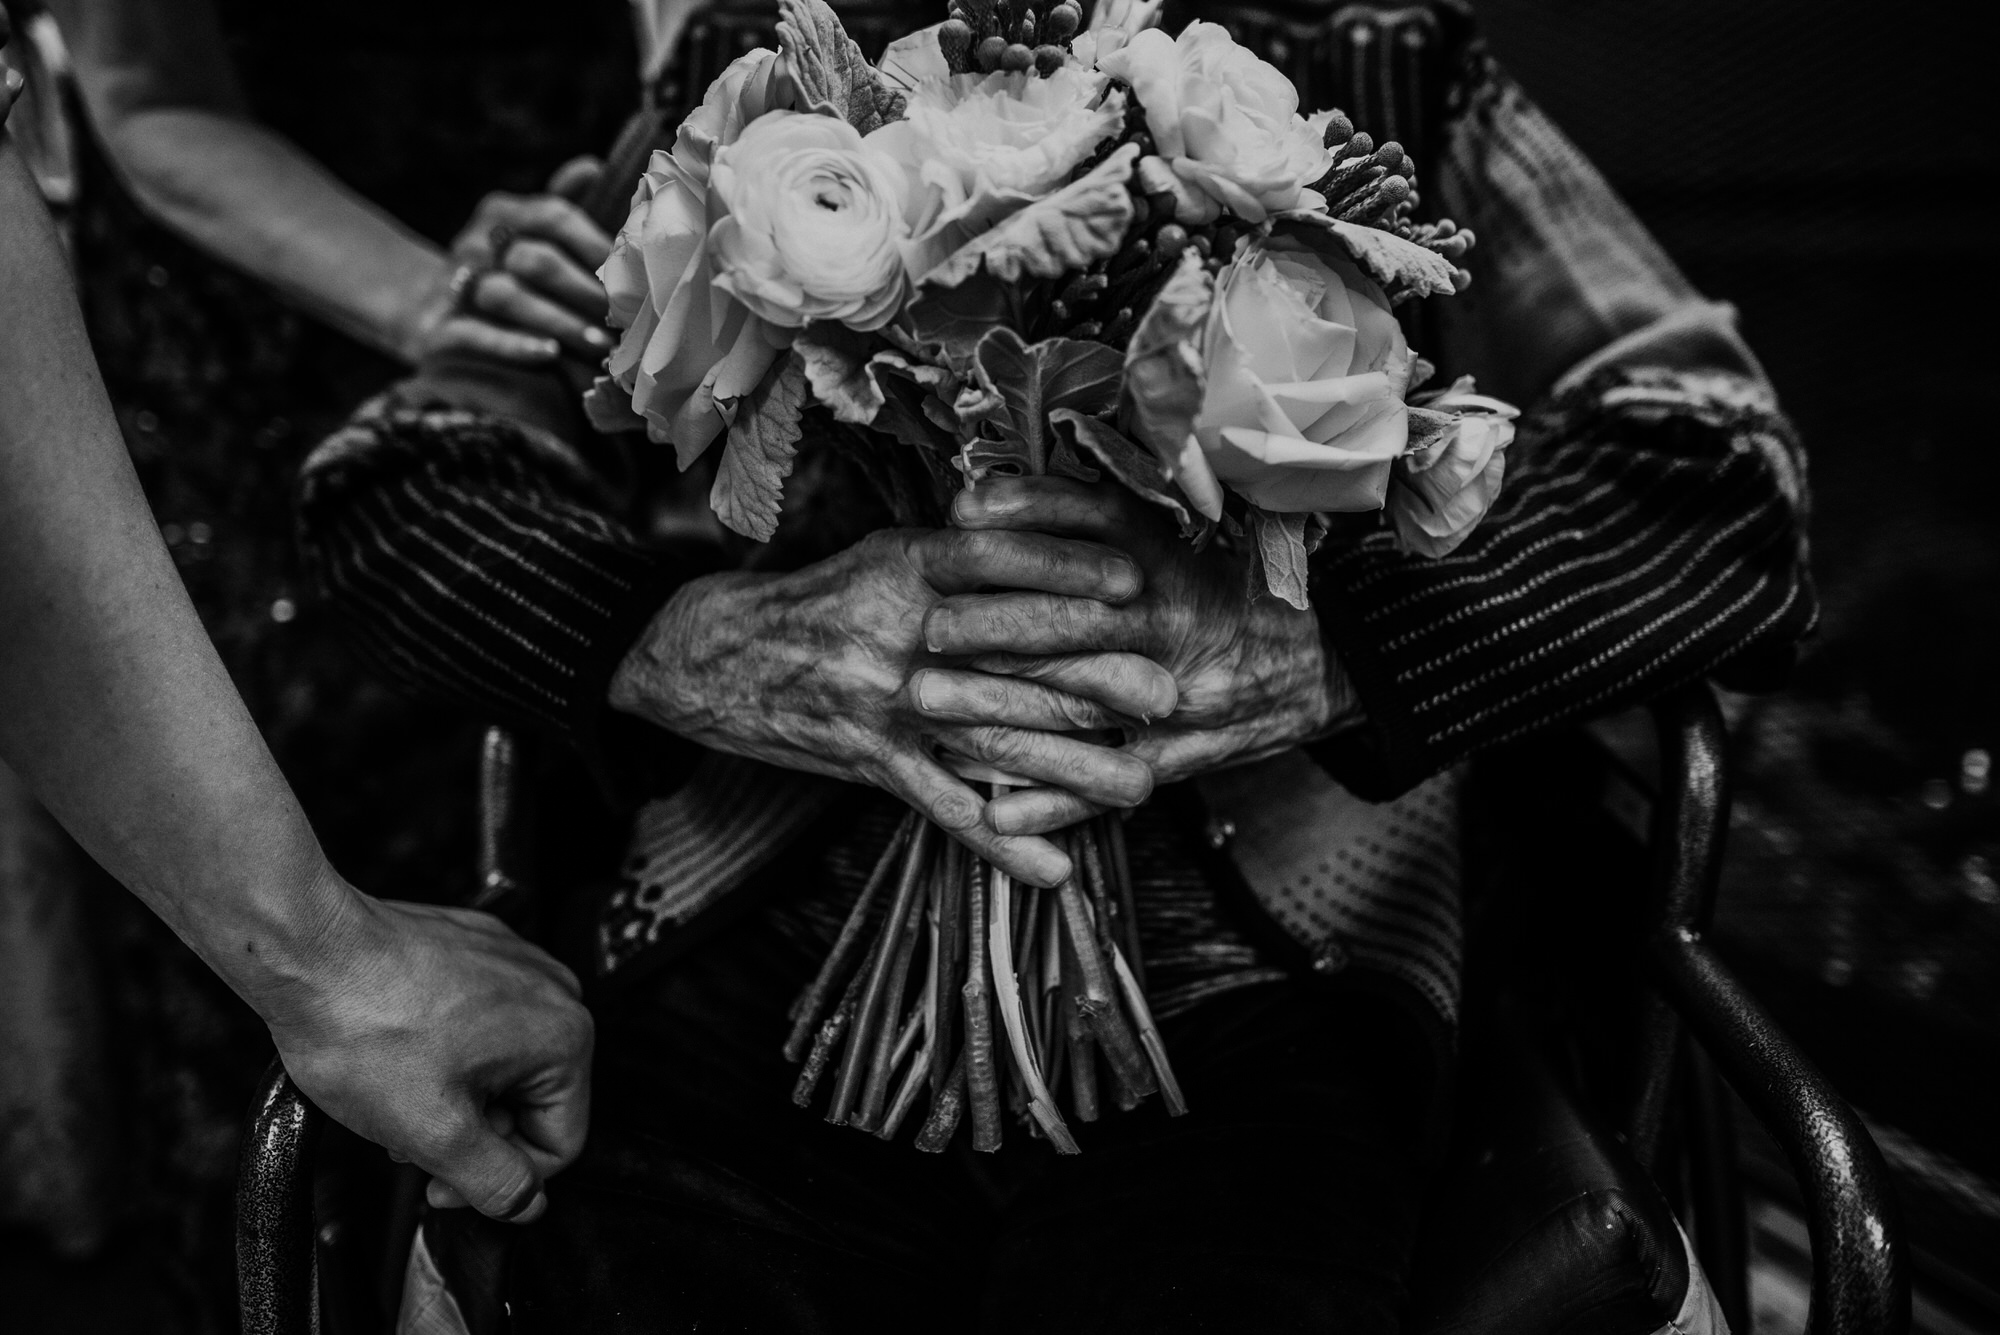 Kaylie_Sirek_Photography_Grand_Island_Kearney_Hastings_Lincoln_Nebraska_Wedding_Engagement_Grandma_Grandparent_Delray_Downtown_DowntownLincoln_LNK_Emotional_Bride_Groom_Photographer_48.jpg